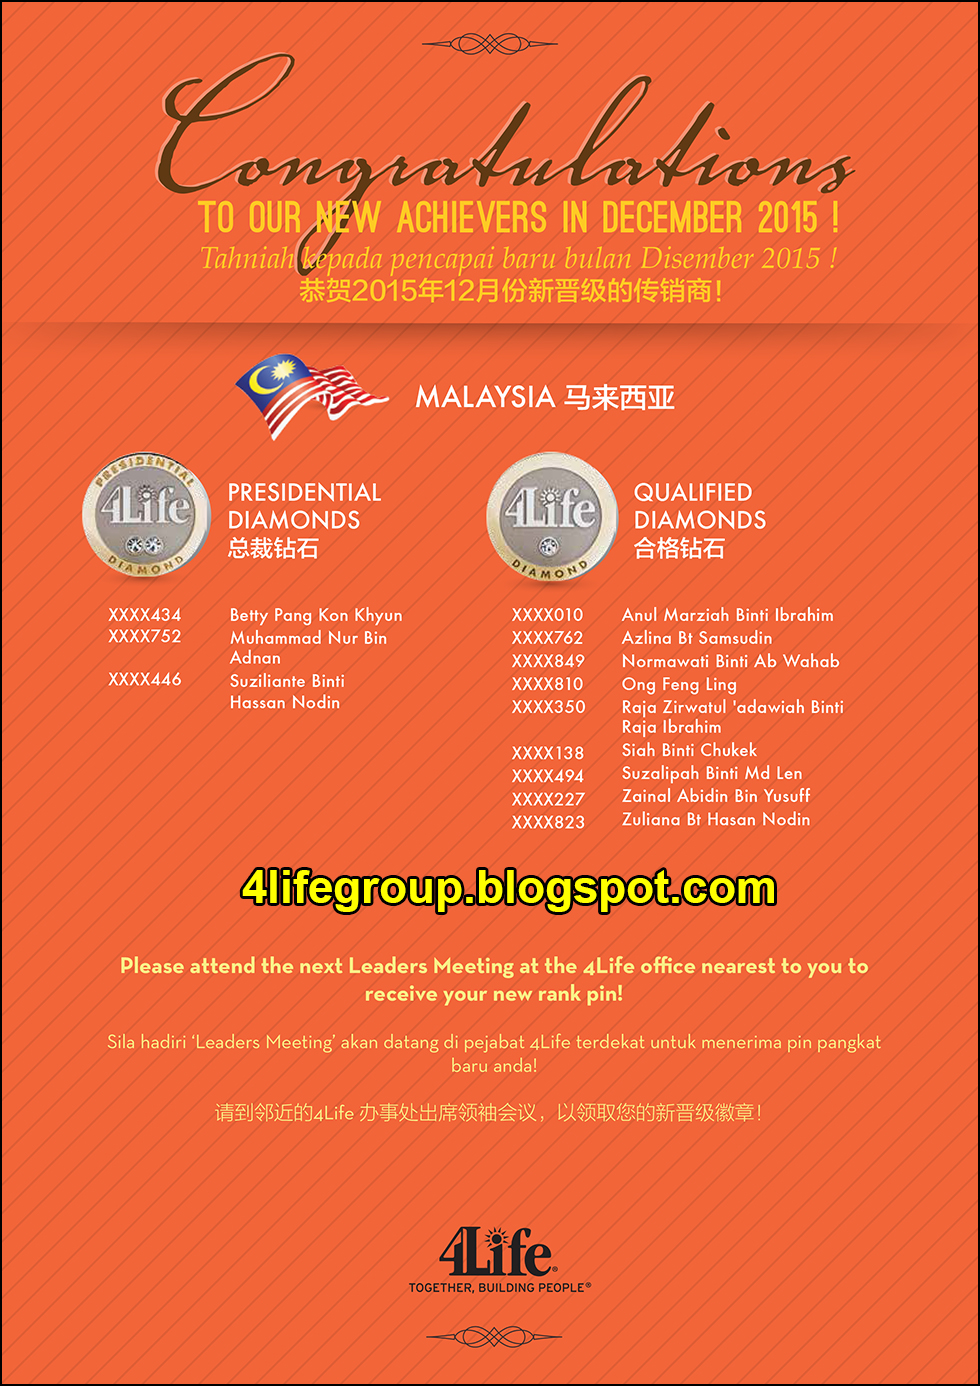 foto Pencapai Pangkat Baru Disember 2015 4Life Malaysia